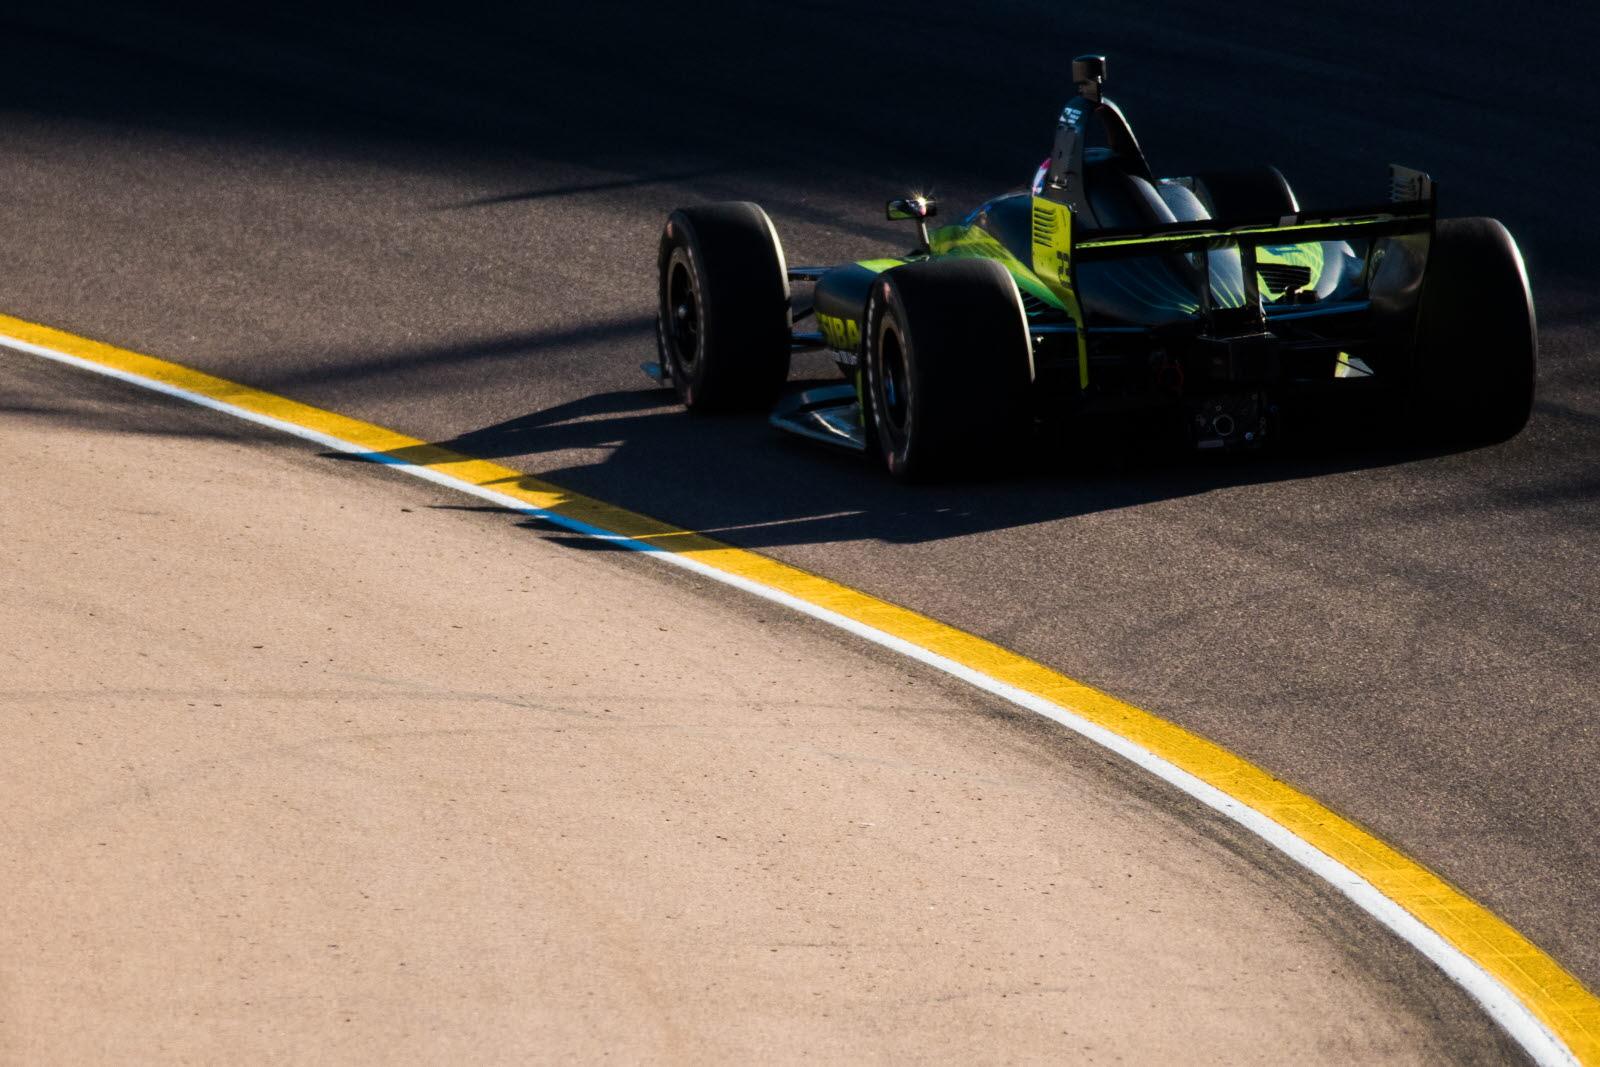 Charlie Kimball on track at ISM Raceway. [credit Jamie Sheldrick / Spacesuit Media]